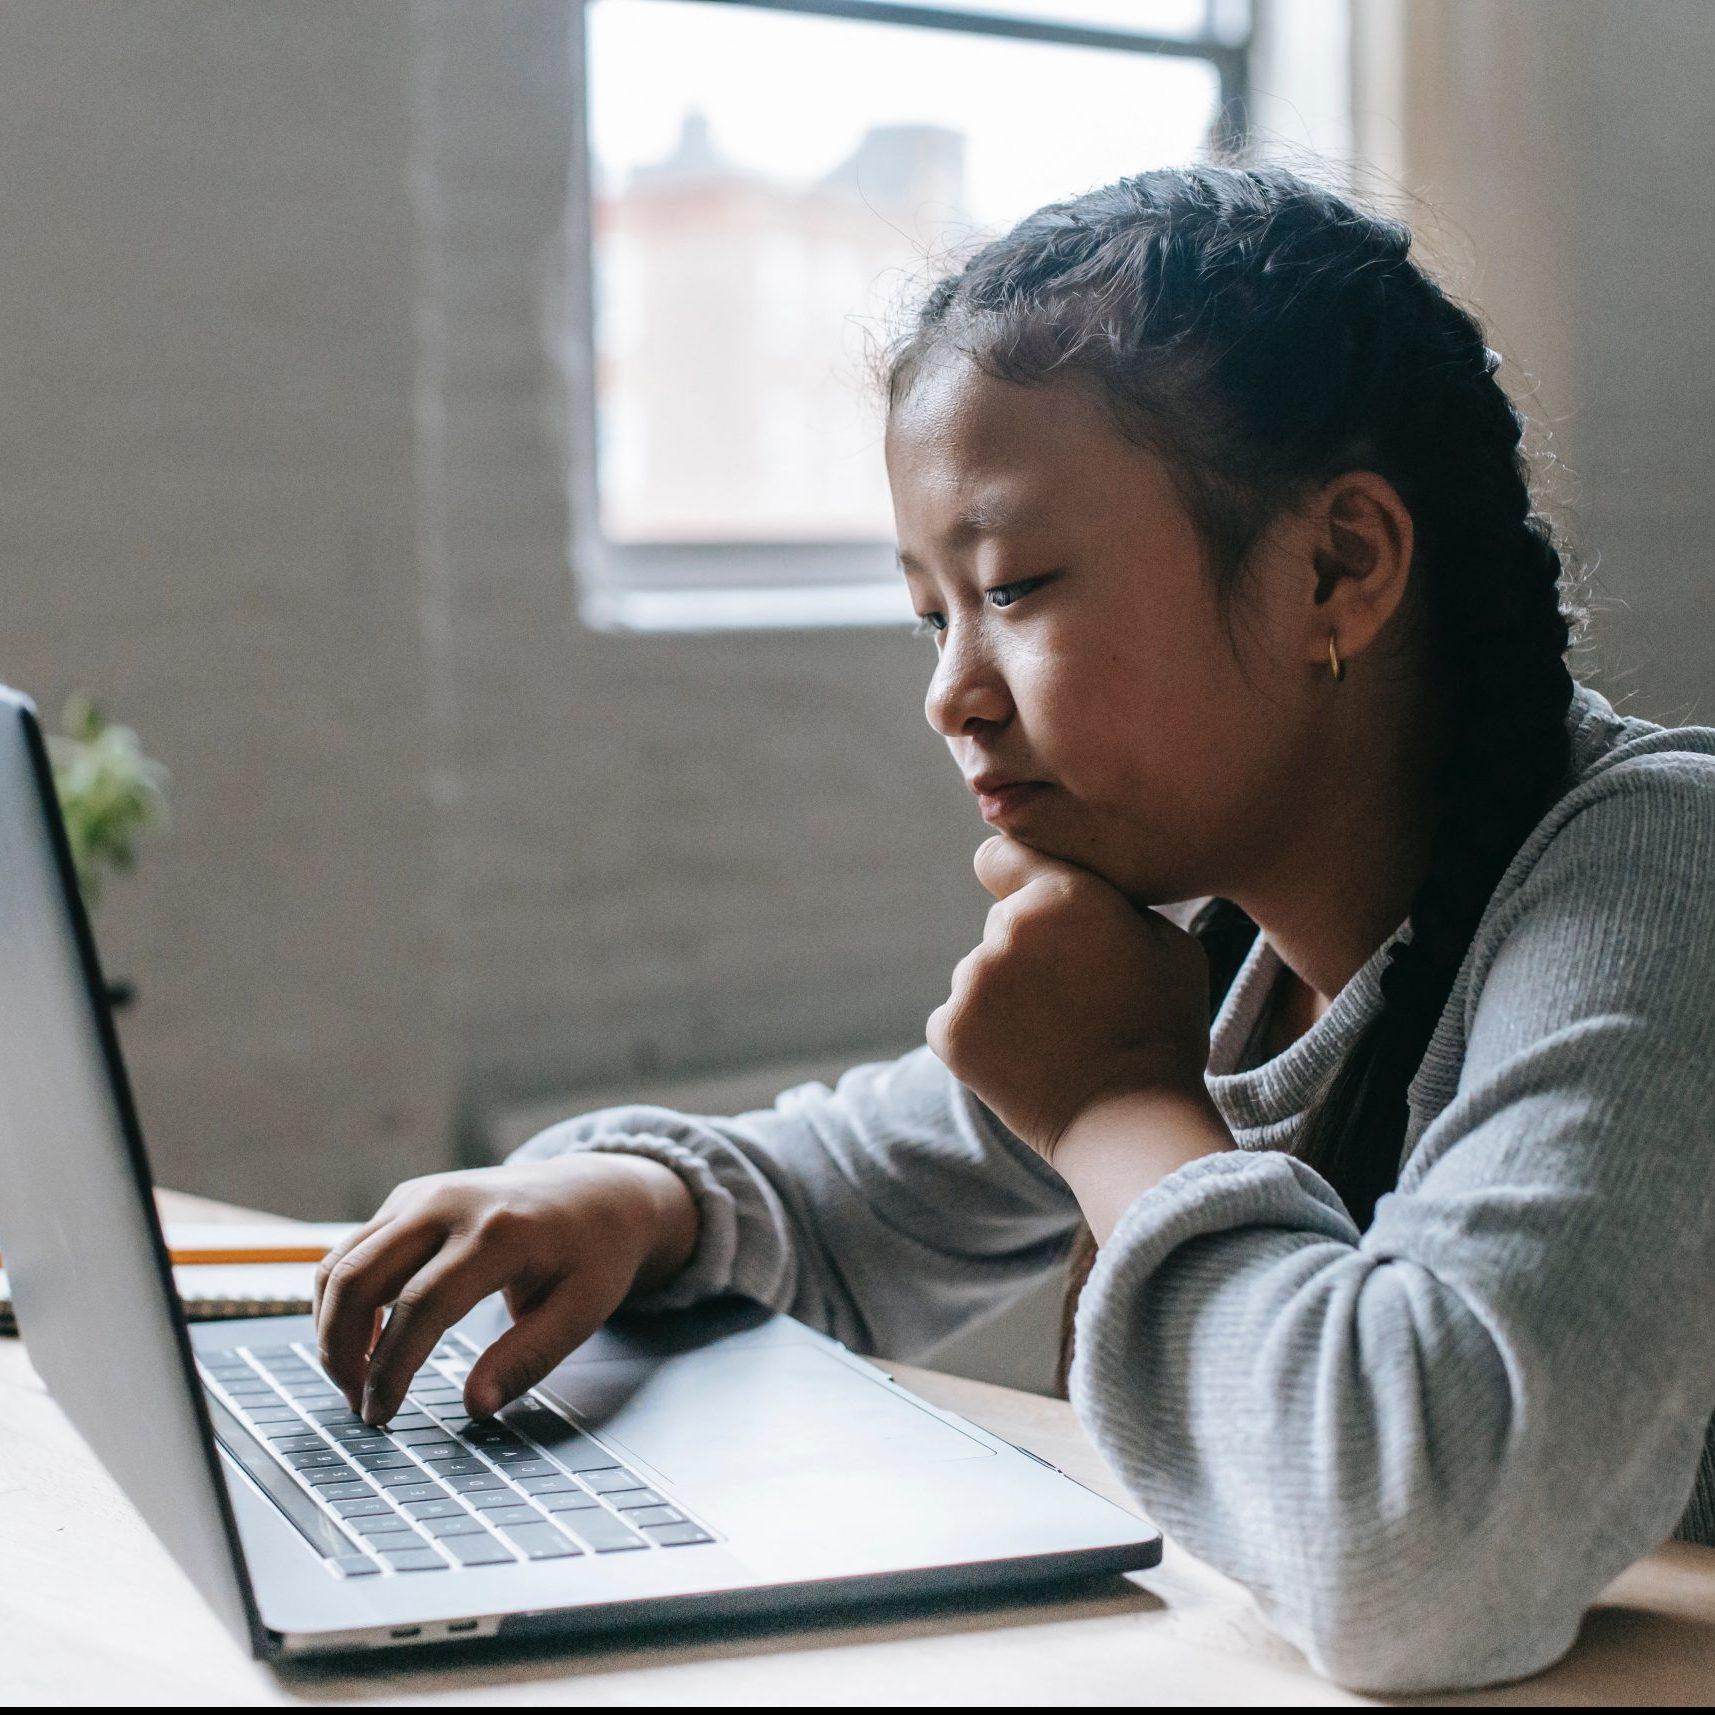 Elementary School Student Using Computer